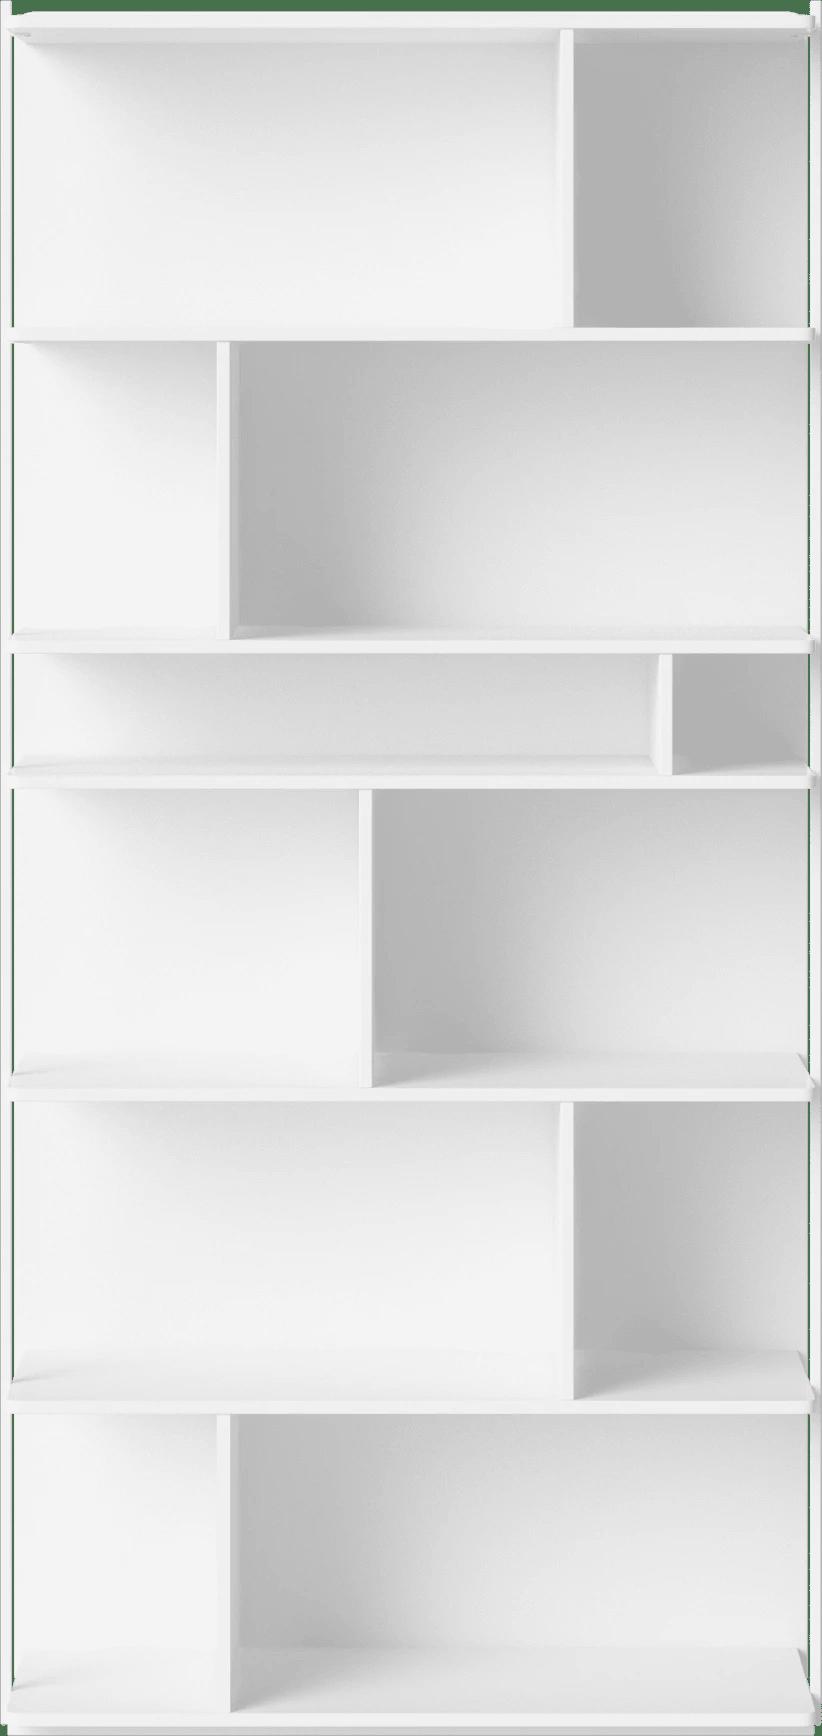 bolia_structure_rack_low_polc_polcrendszer_living_room_furniture_nappali_butor_MDF_innoconcept_design_furniture_desing_butor_03